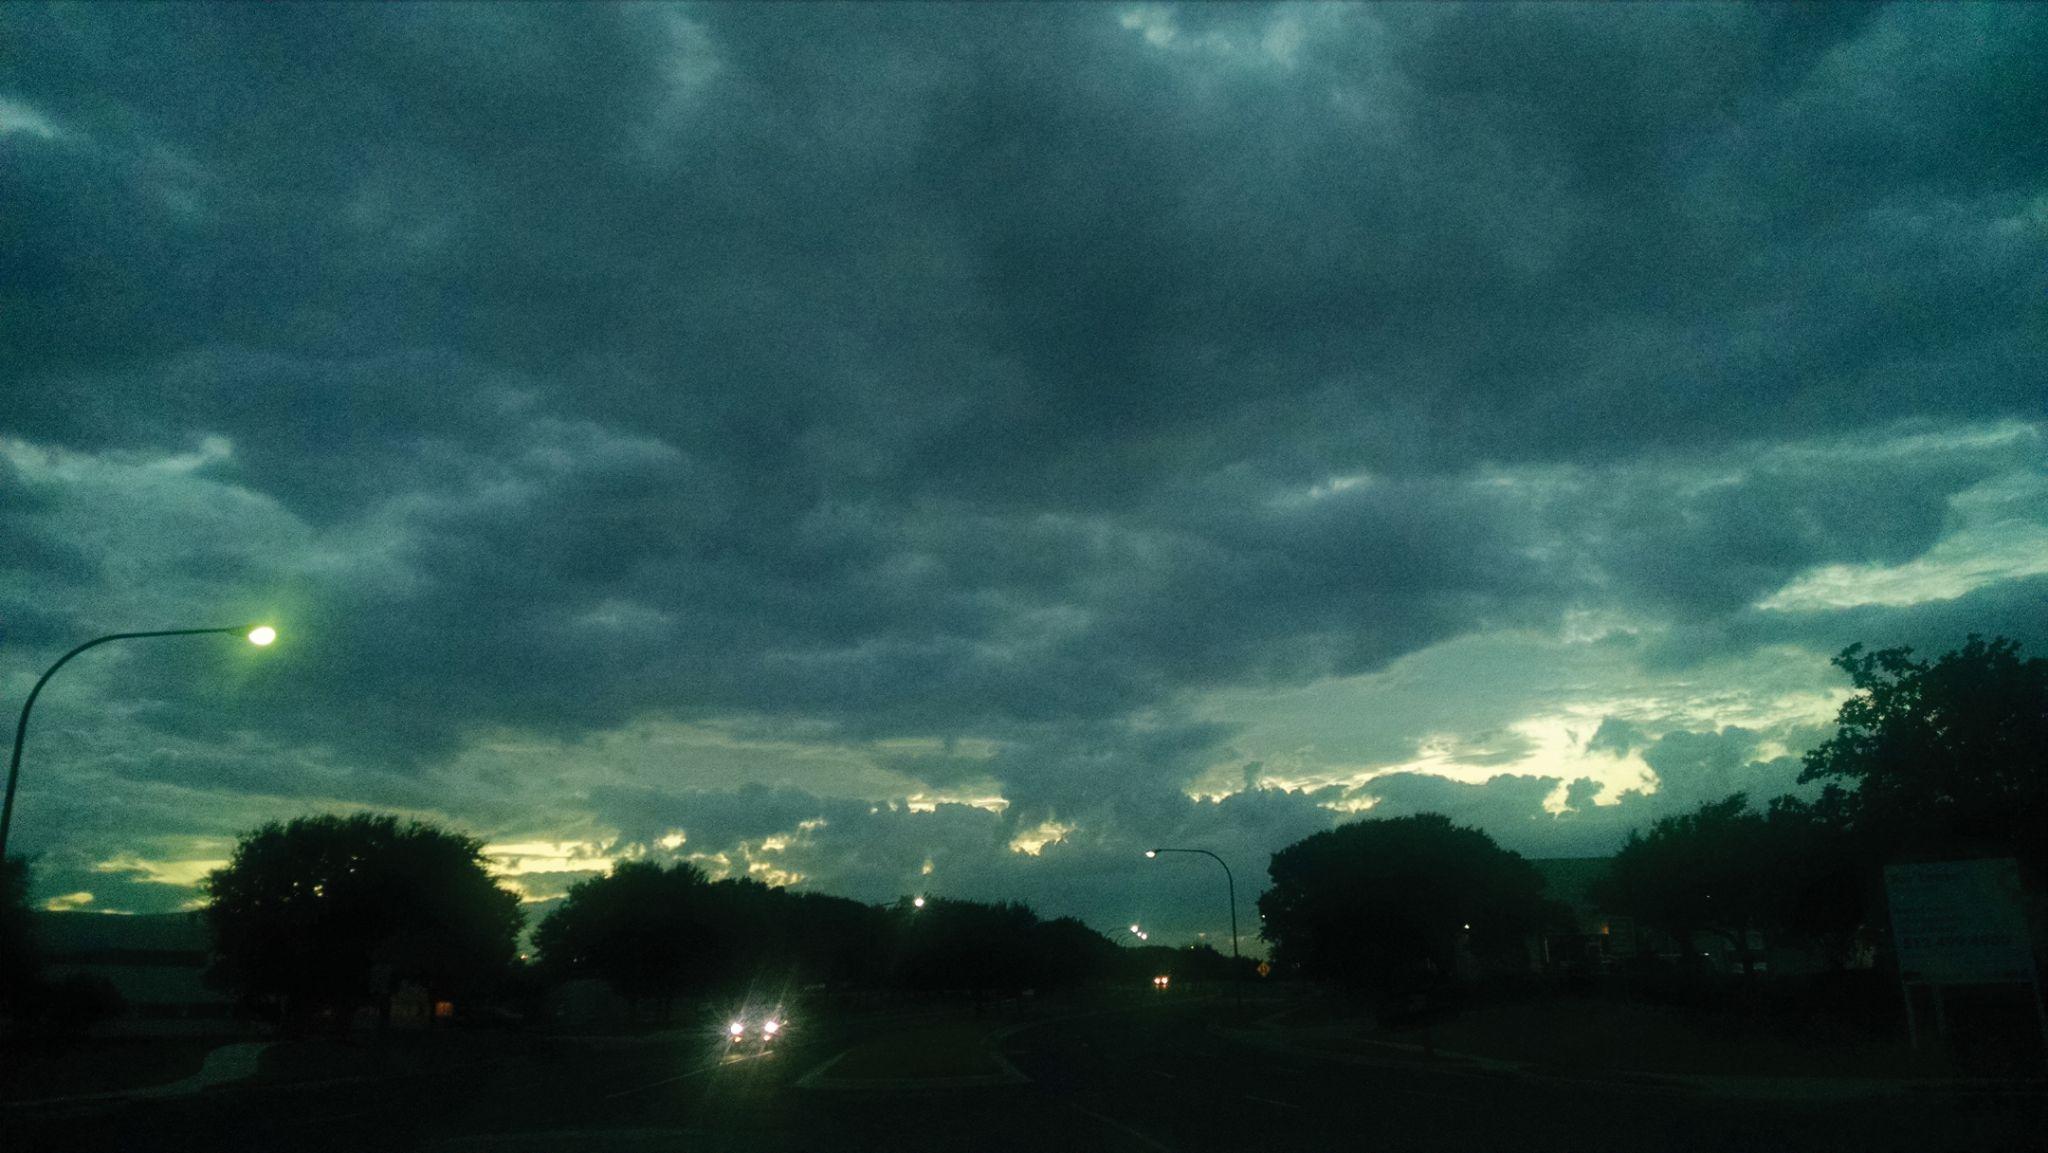 A Night with No Rain by astroskim